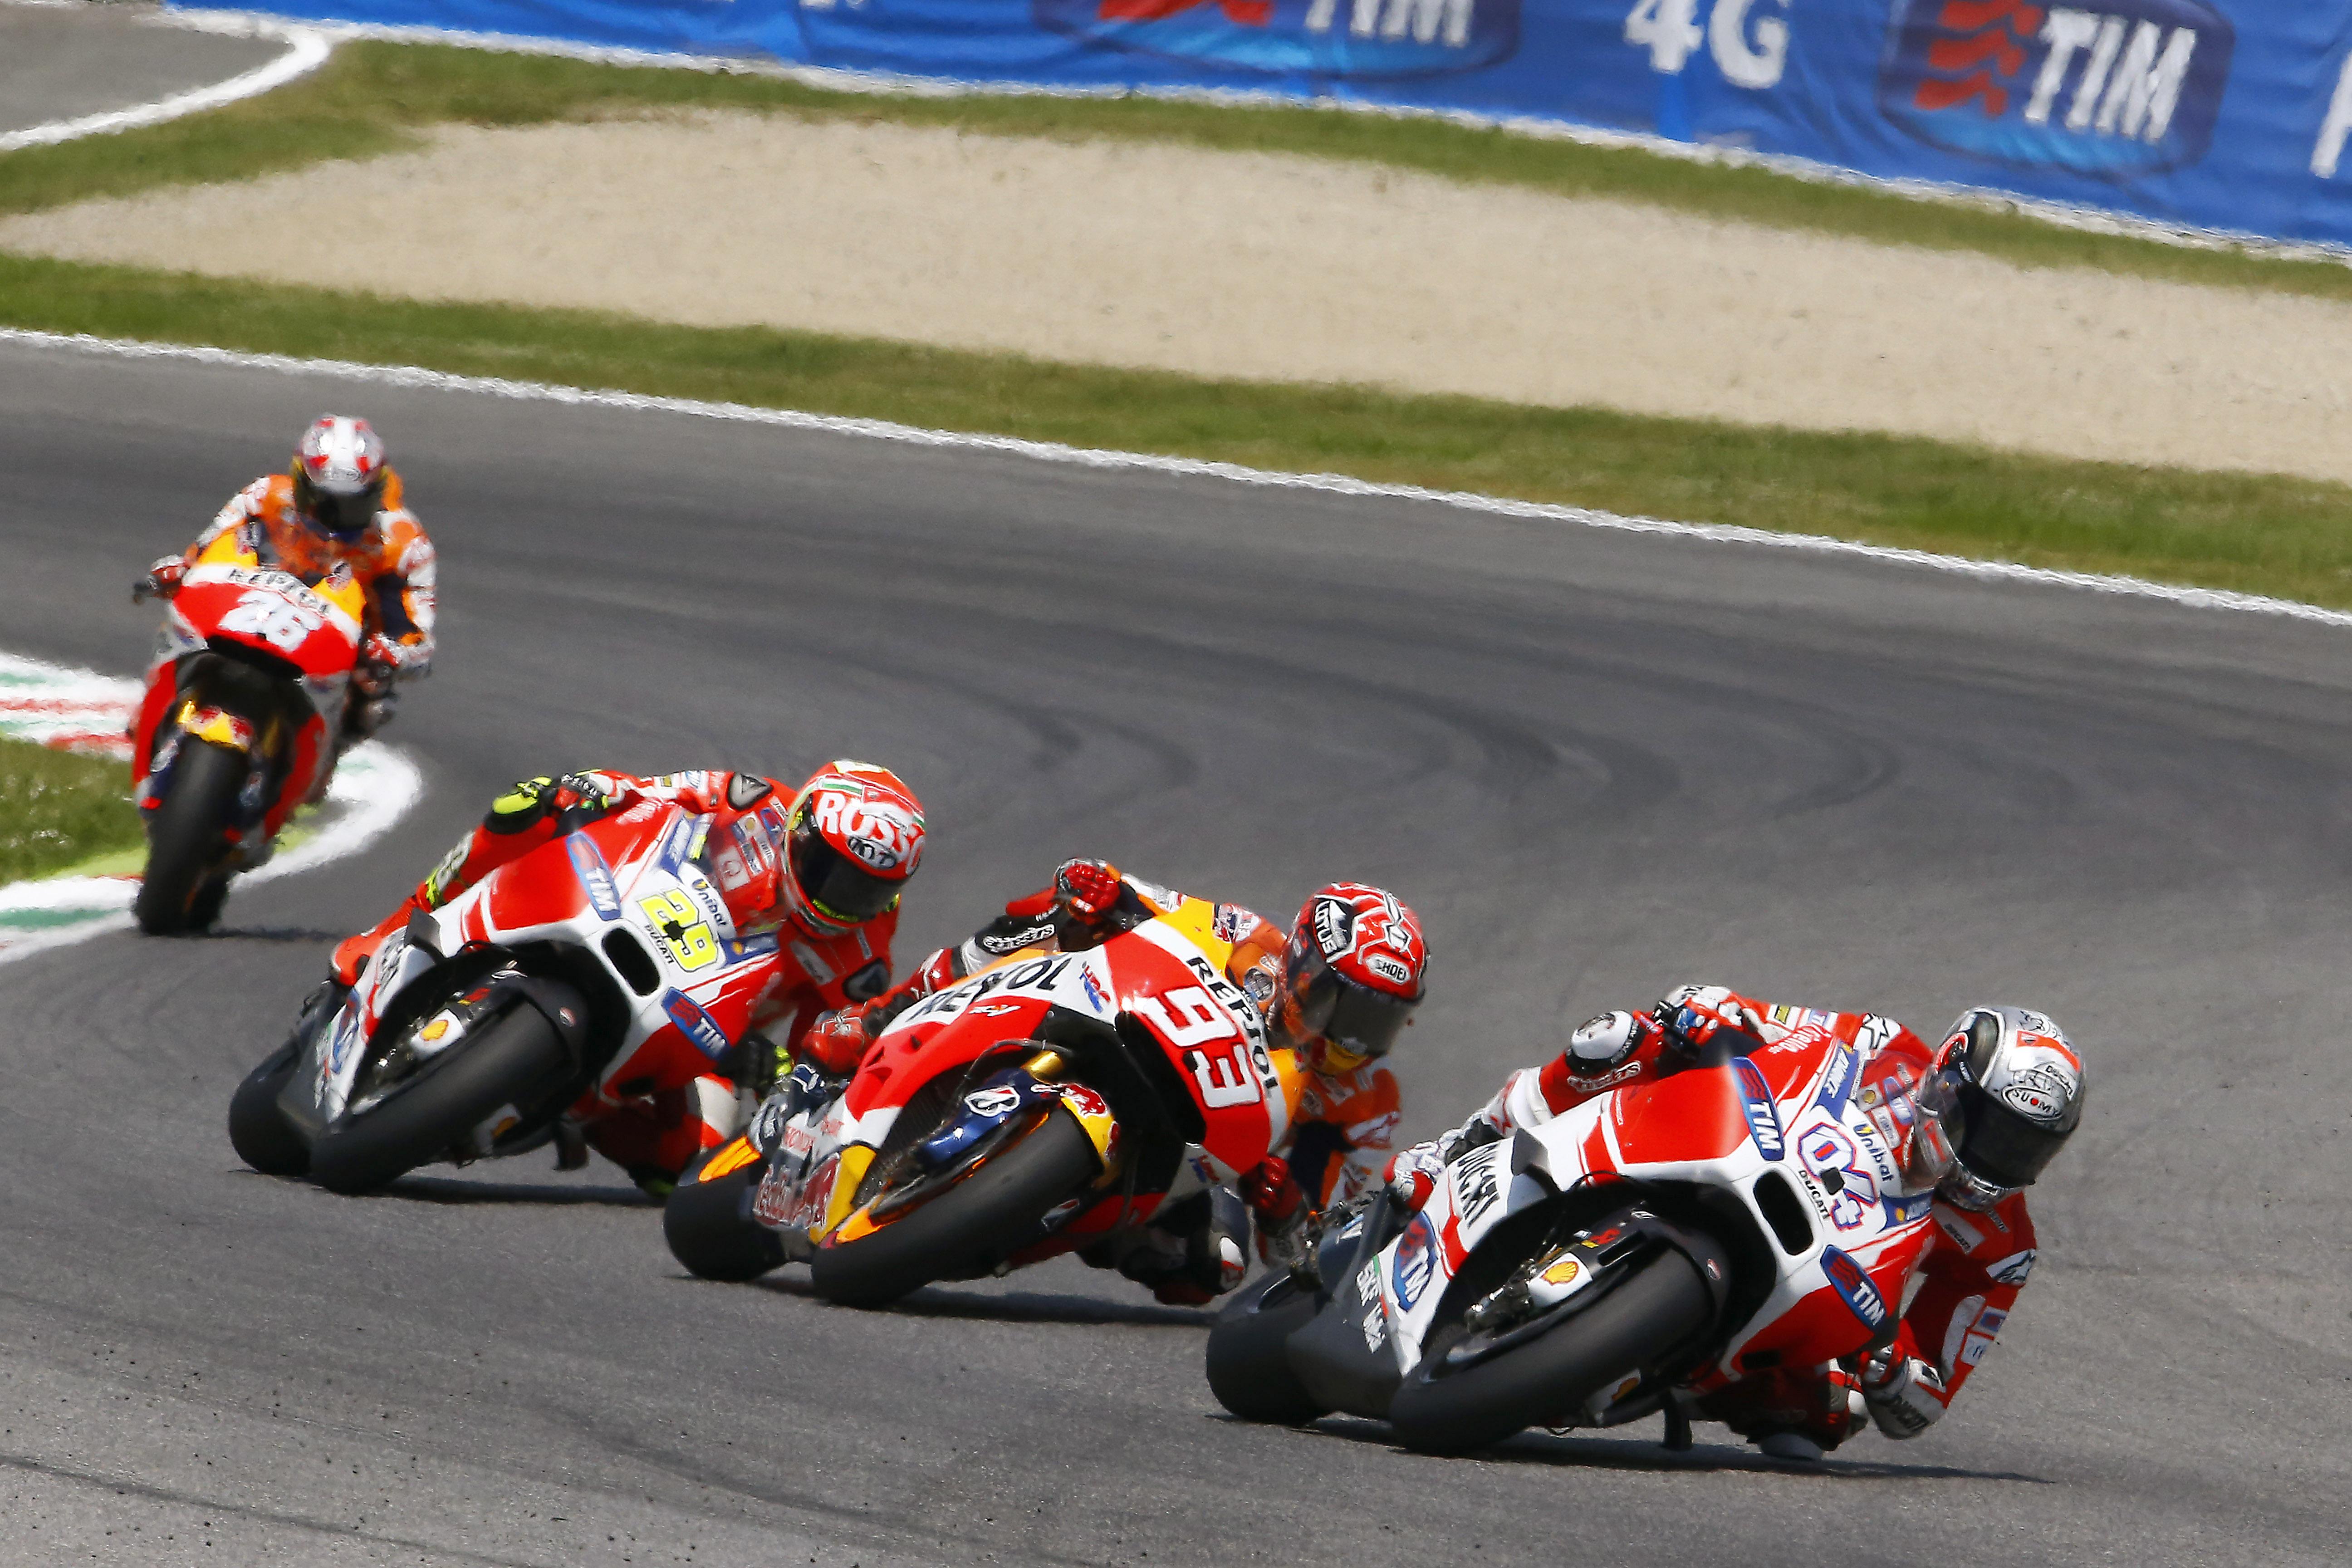 MotoGP 2015: Mugello race results